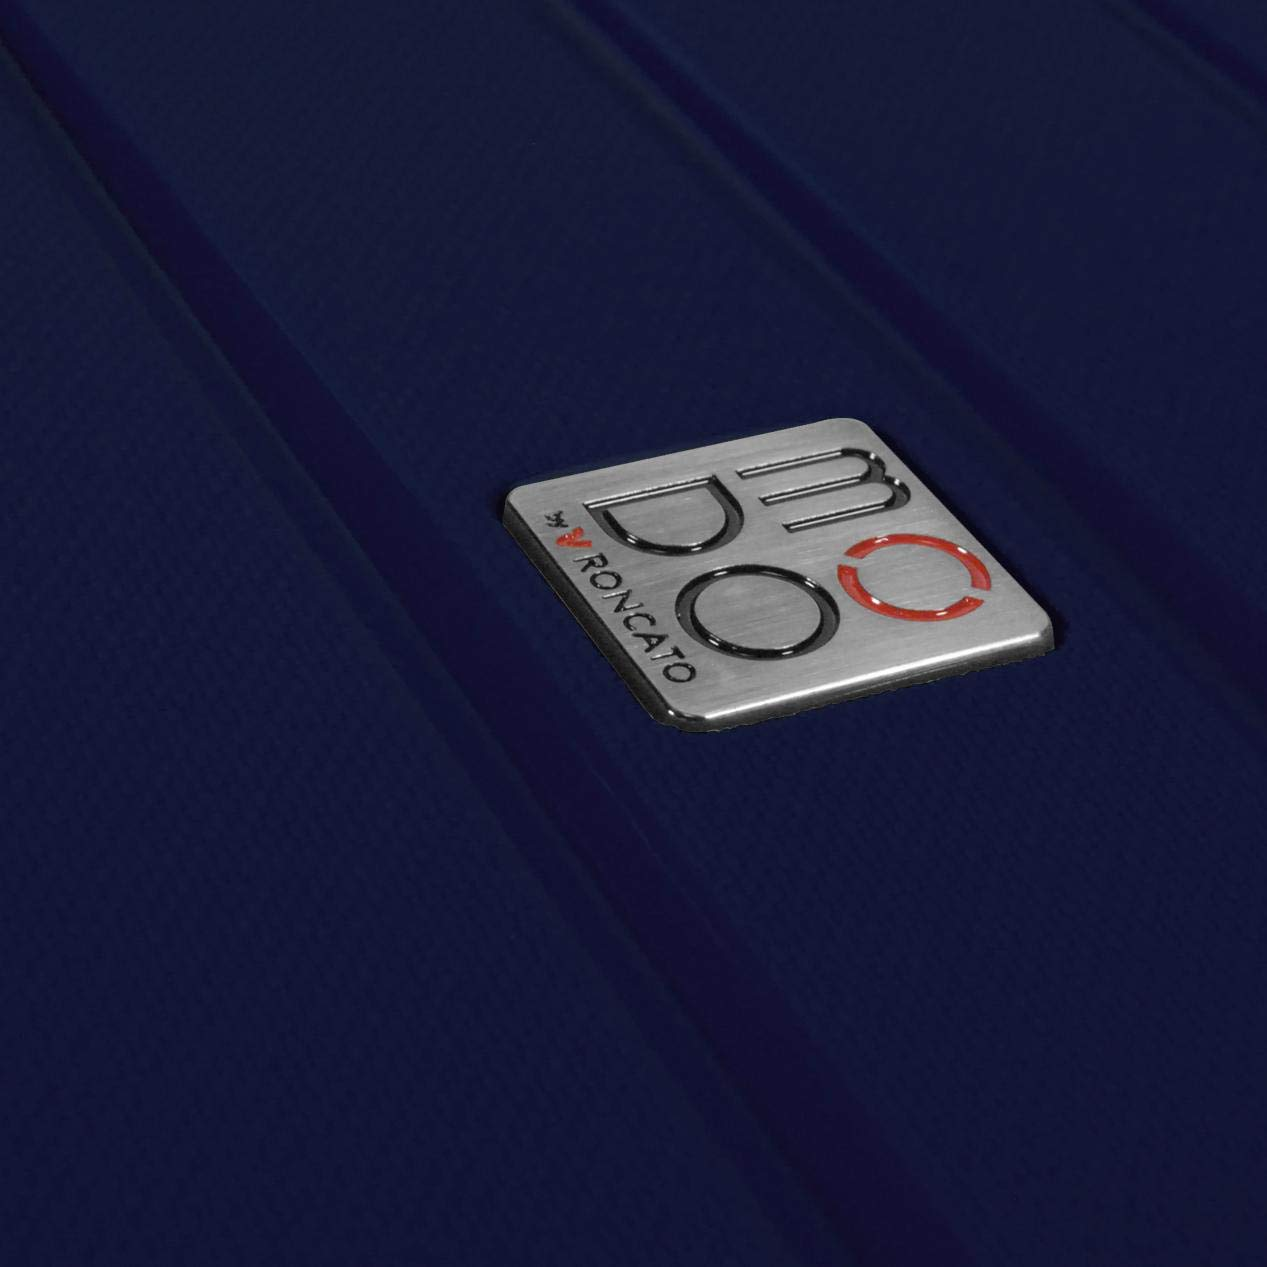 BLU Notte 116 Liters Azul Starlight 2.0 Trolley para port/átil